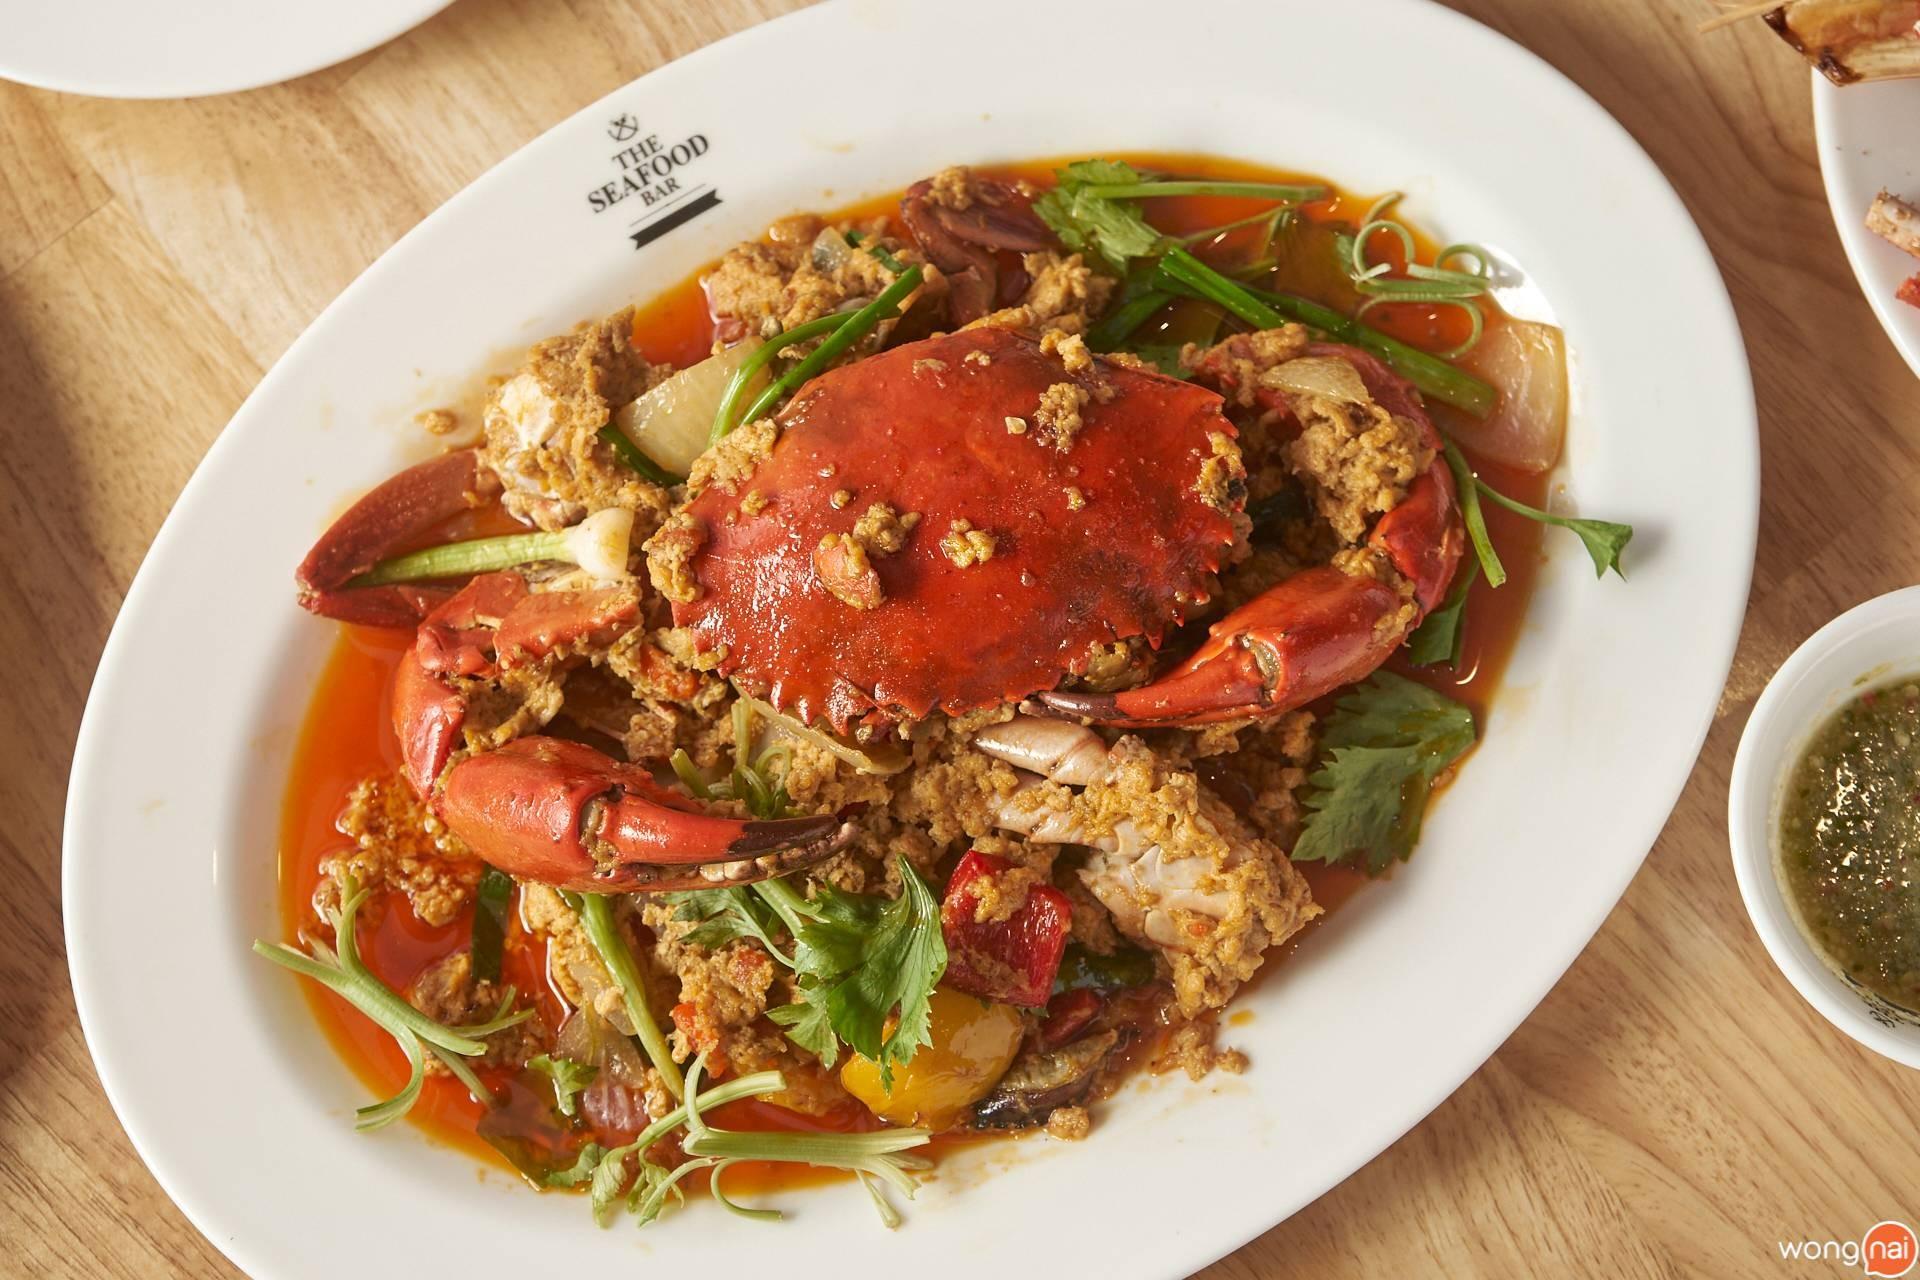 The Seafood Bar by ส้มตำคุณแดง  ปูผัดผงกะหรี่